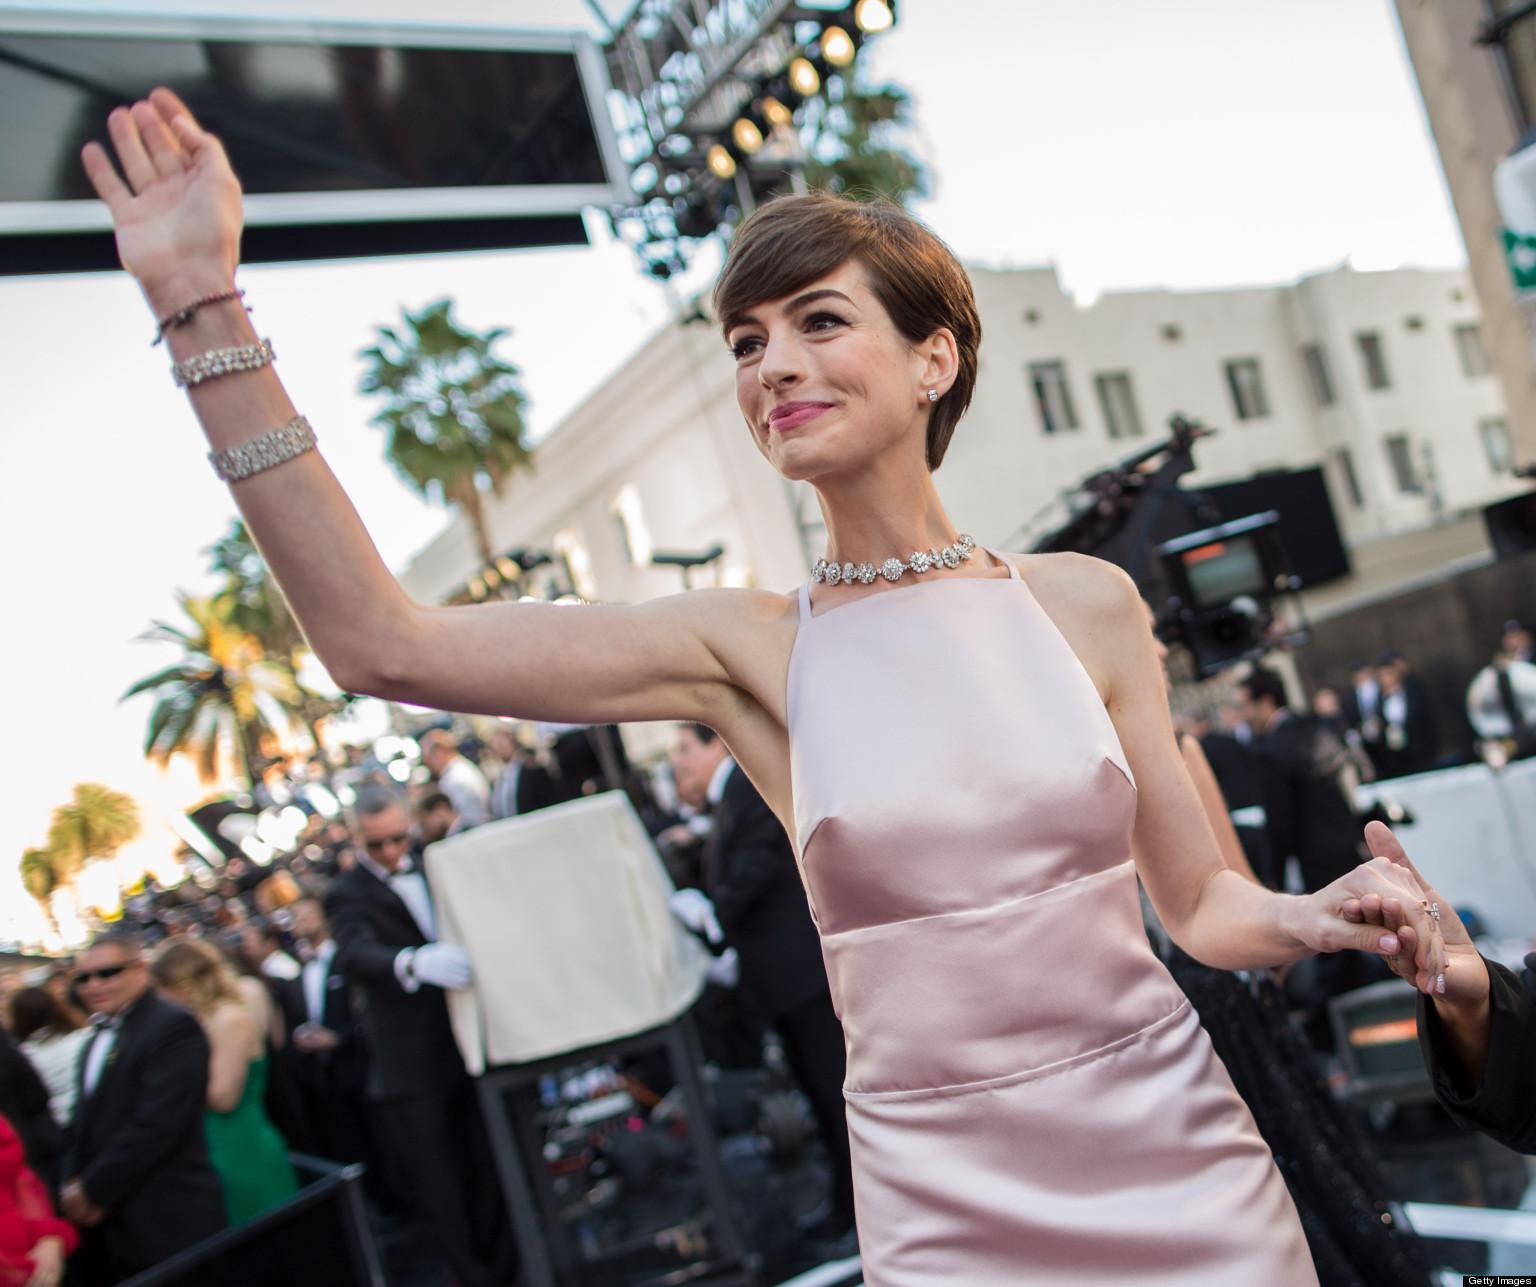 Anne Hathaway In 'Laggies' With Chloe Moretz; Oscar Winner